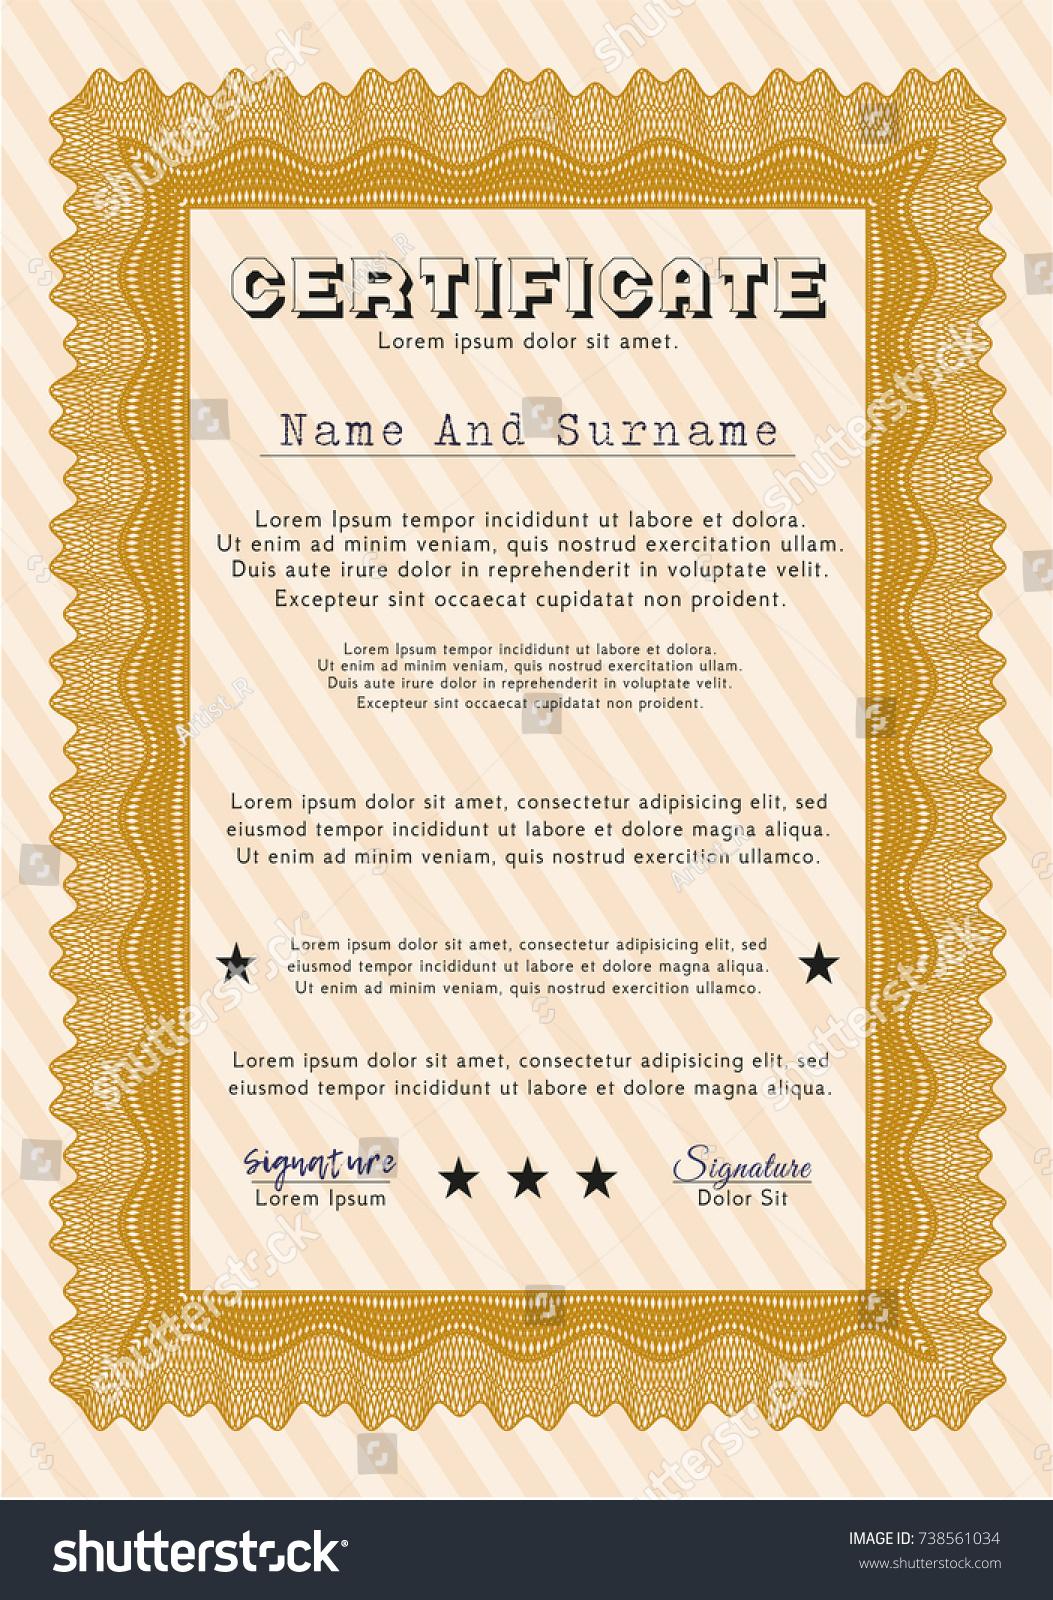 orange certificate diploma template complex background stock  orange certificate or diploma template complex background retro design customizable easy